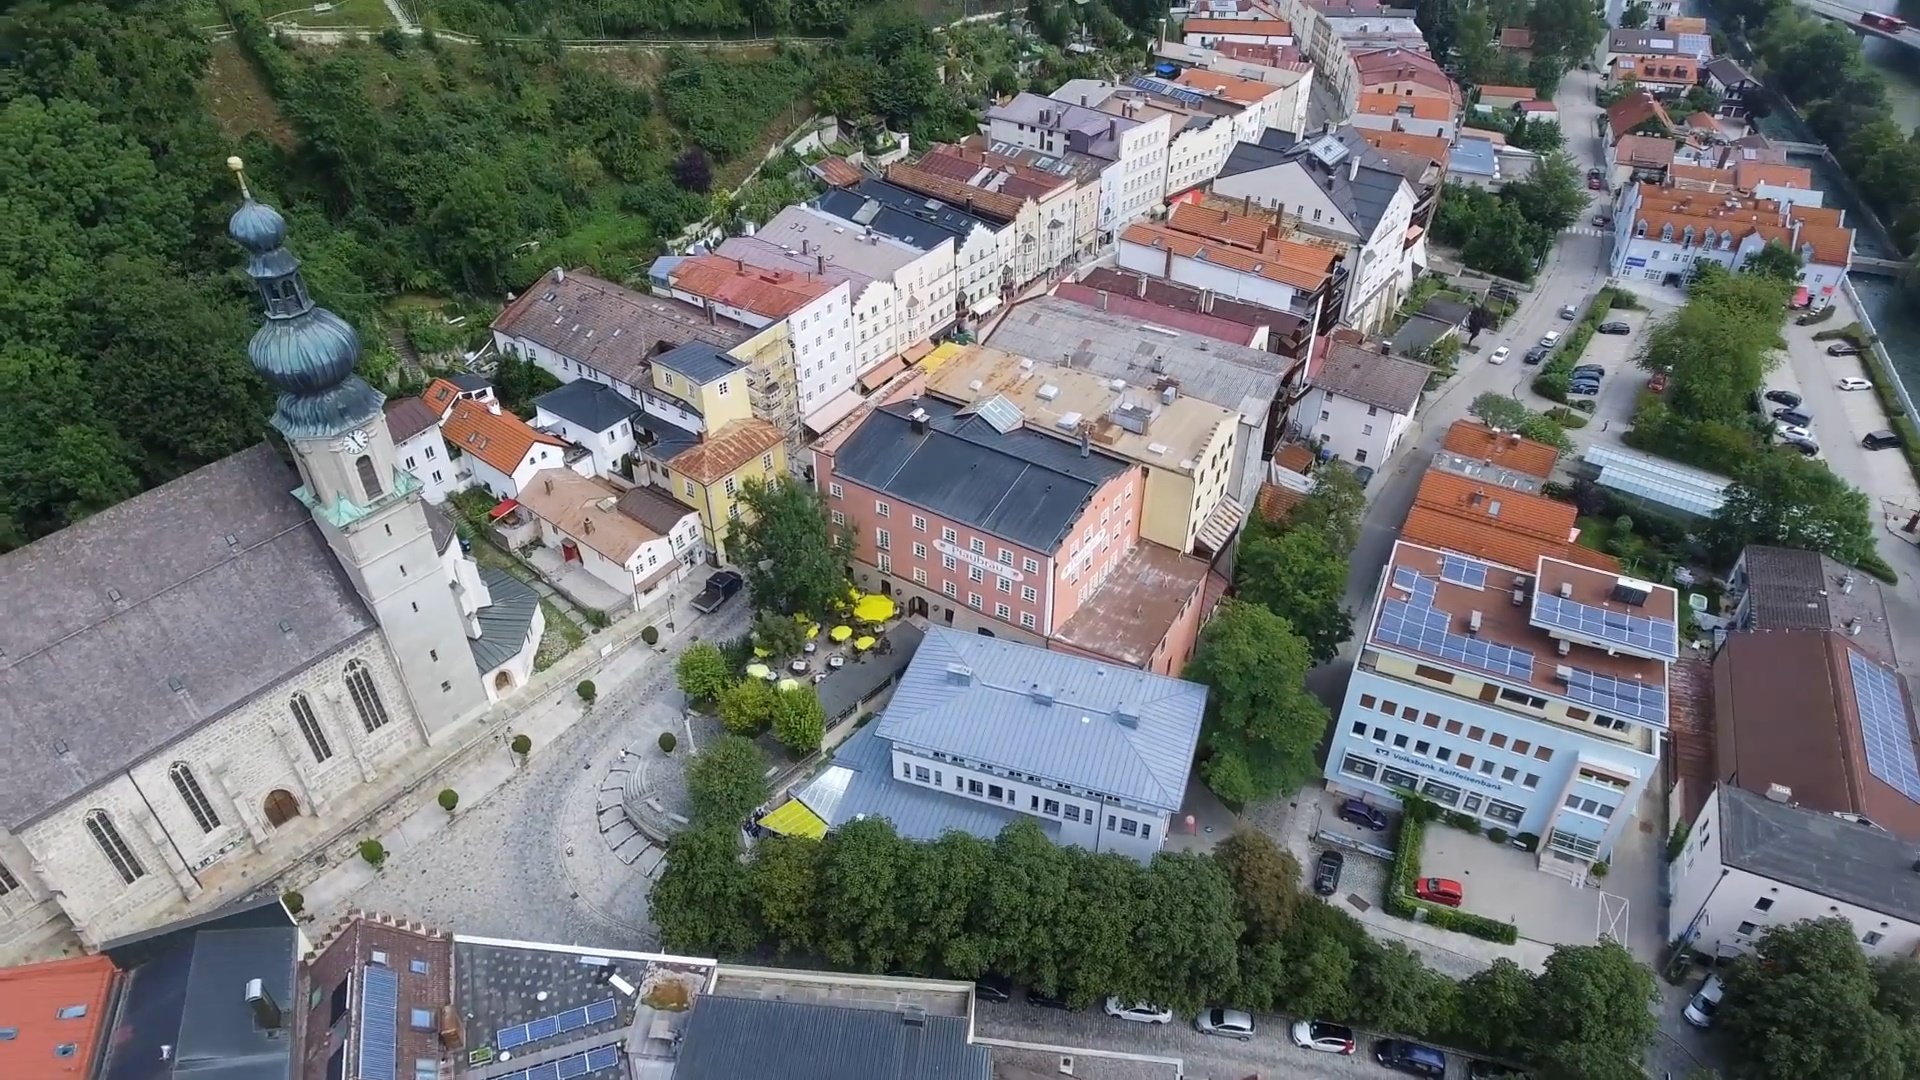 Trostberg Chiemsee-Chiemgau Drohnenaufnahme